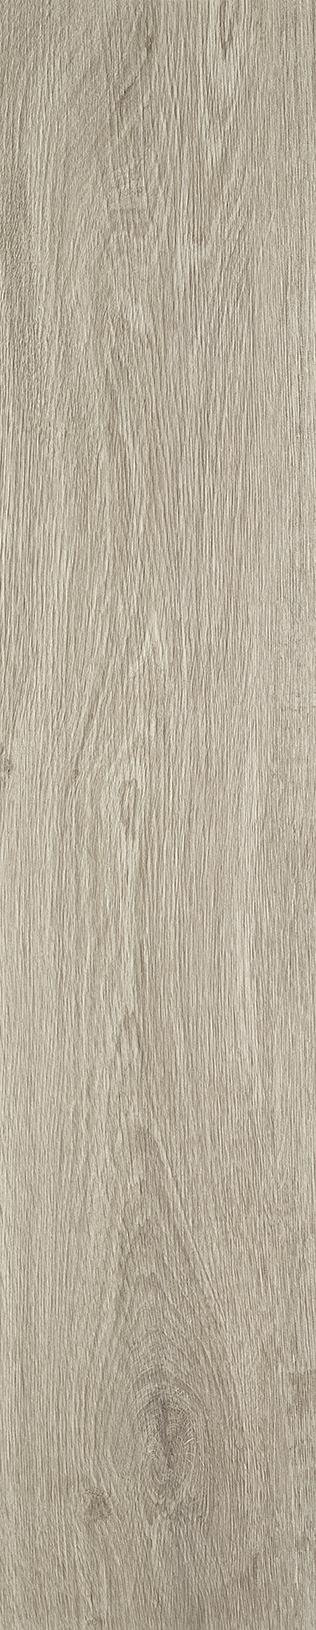 Collezione Timber di Love Tiles  TileScout